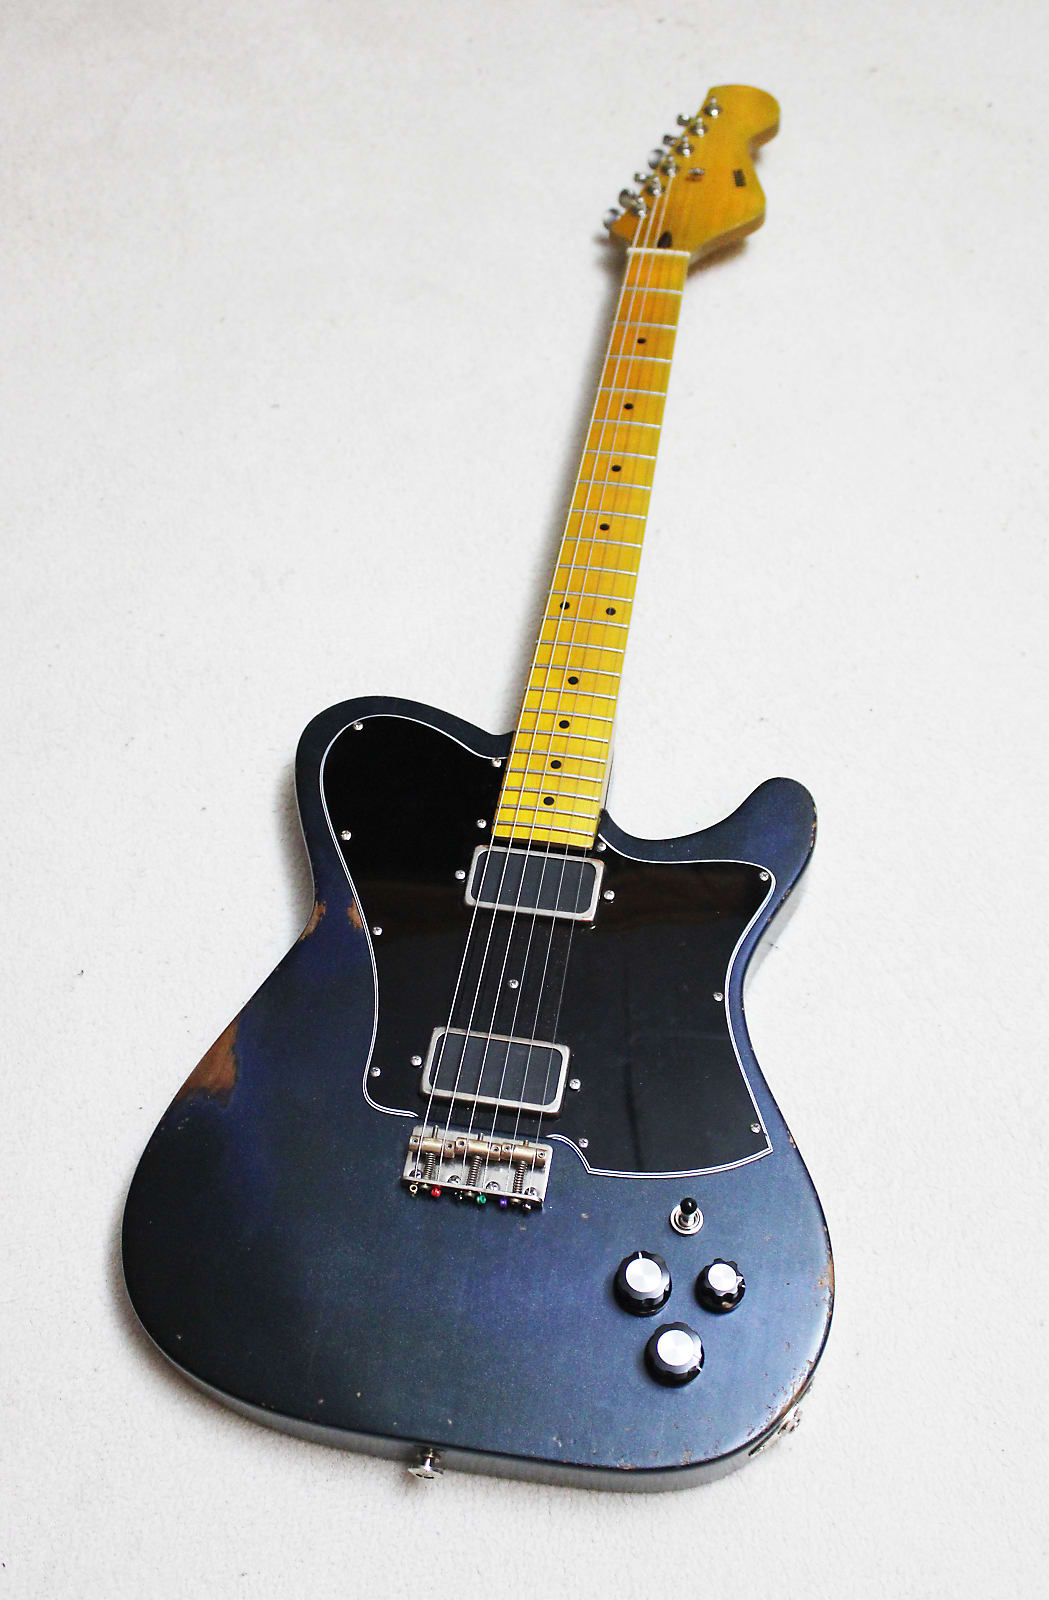 DWG Chubby TL 2020 Aged Metallic Blue Satin Custom Handmade